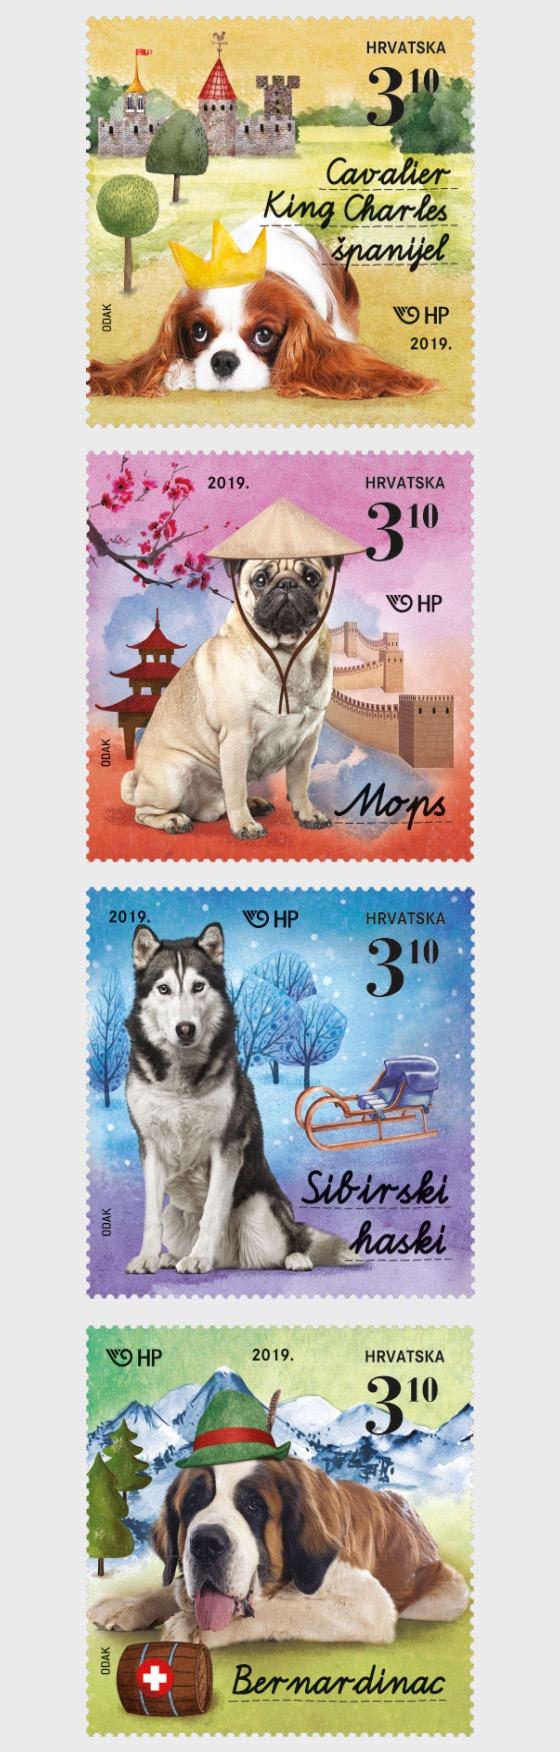 Children's World - Pets, Dogs II - Set